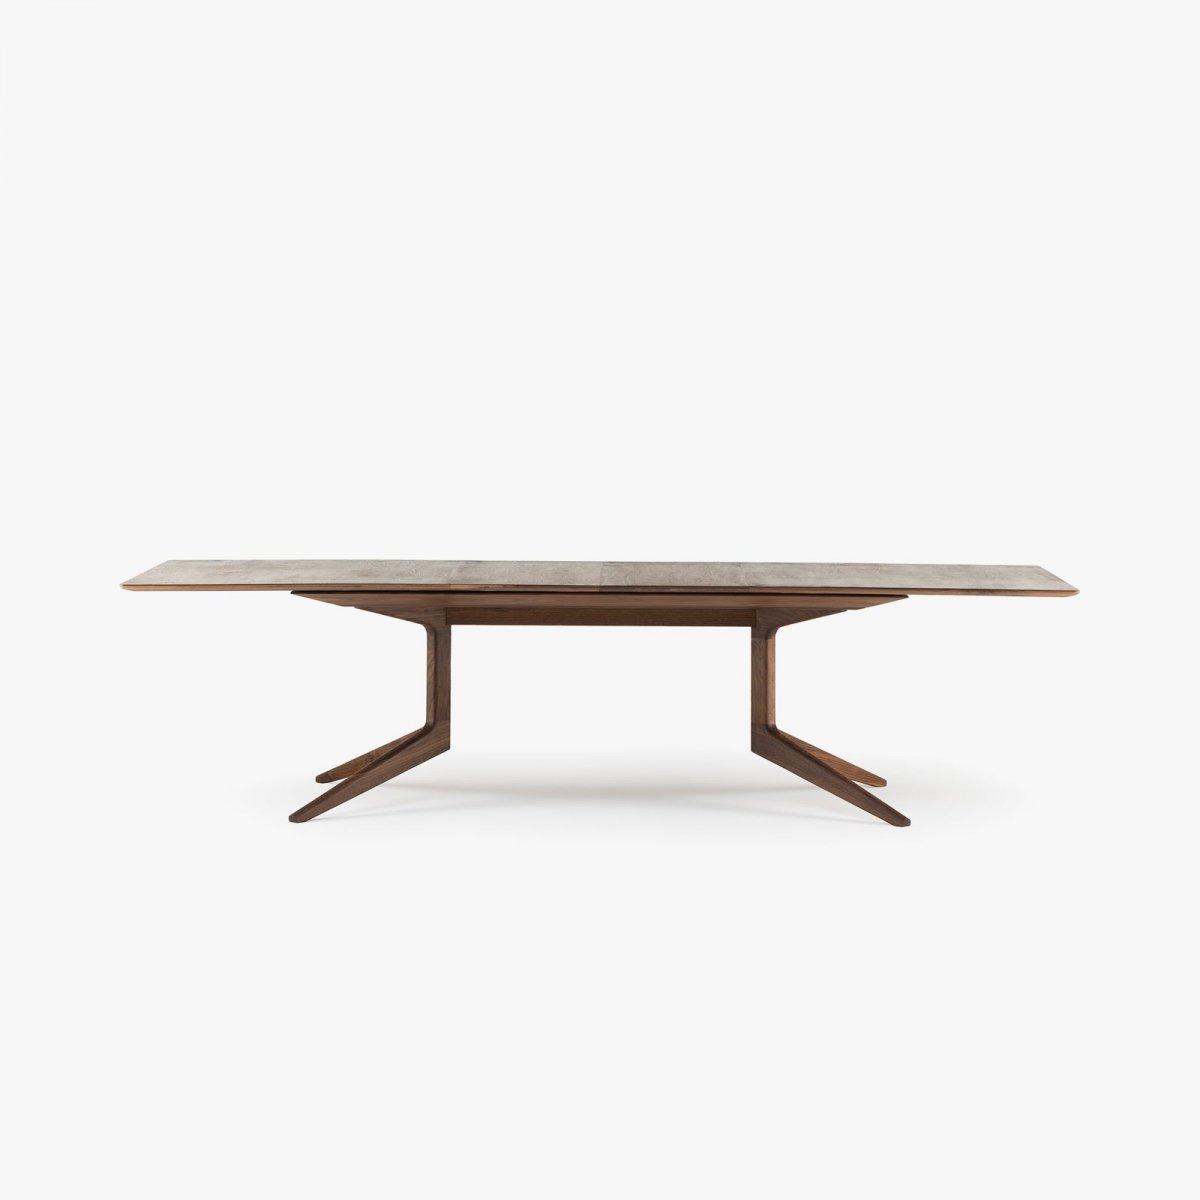 341E Light Extending Table in Danish oiled walnut, 2 leaves in place.